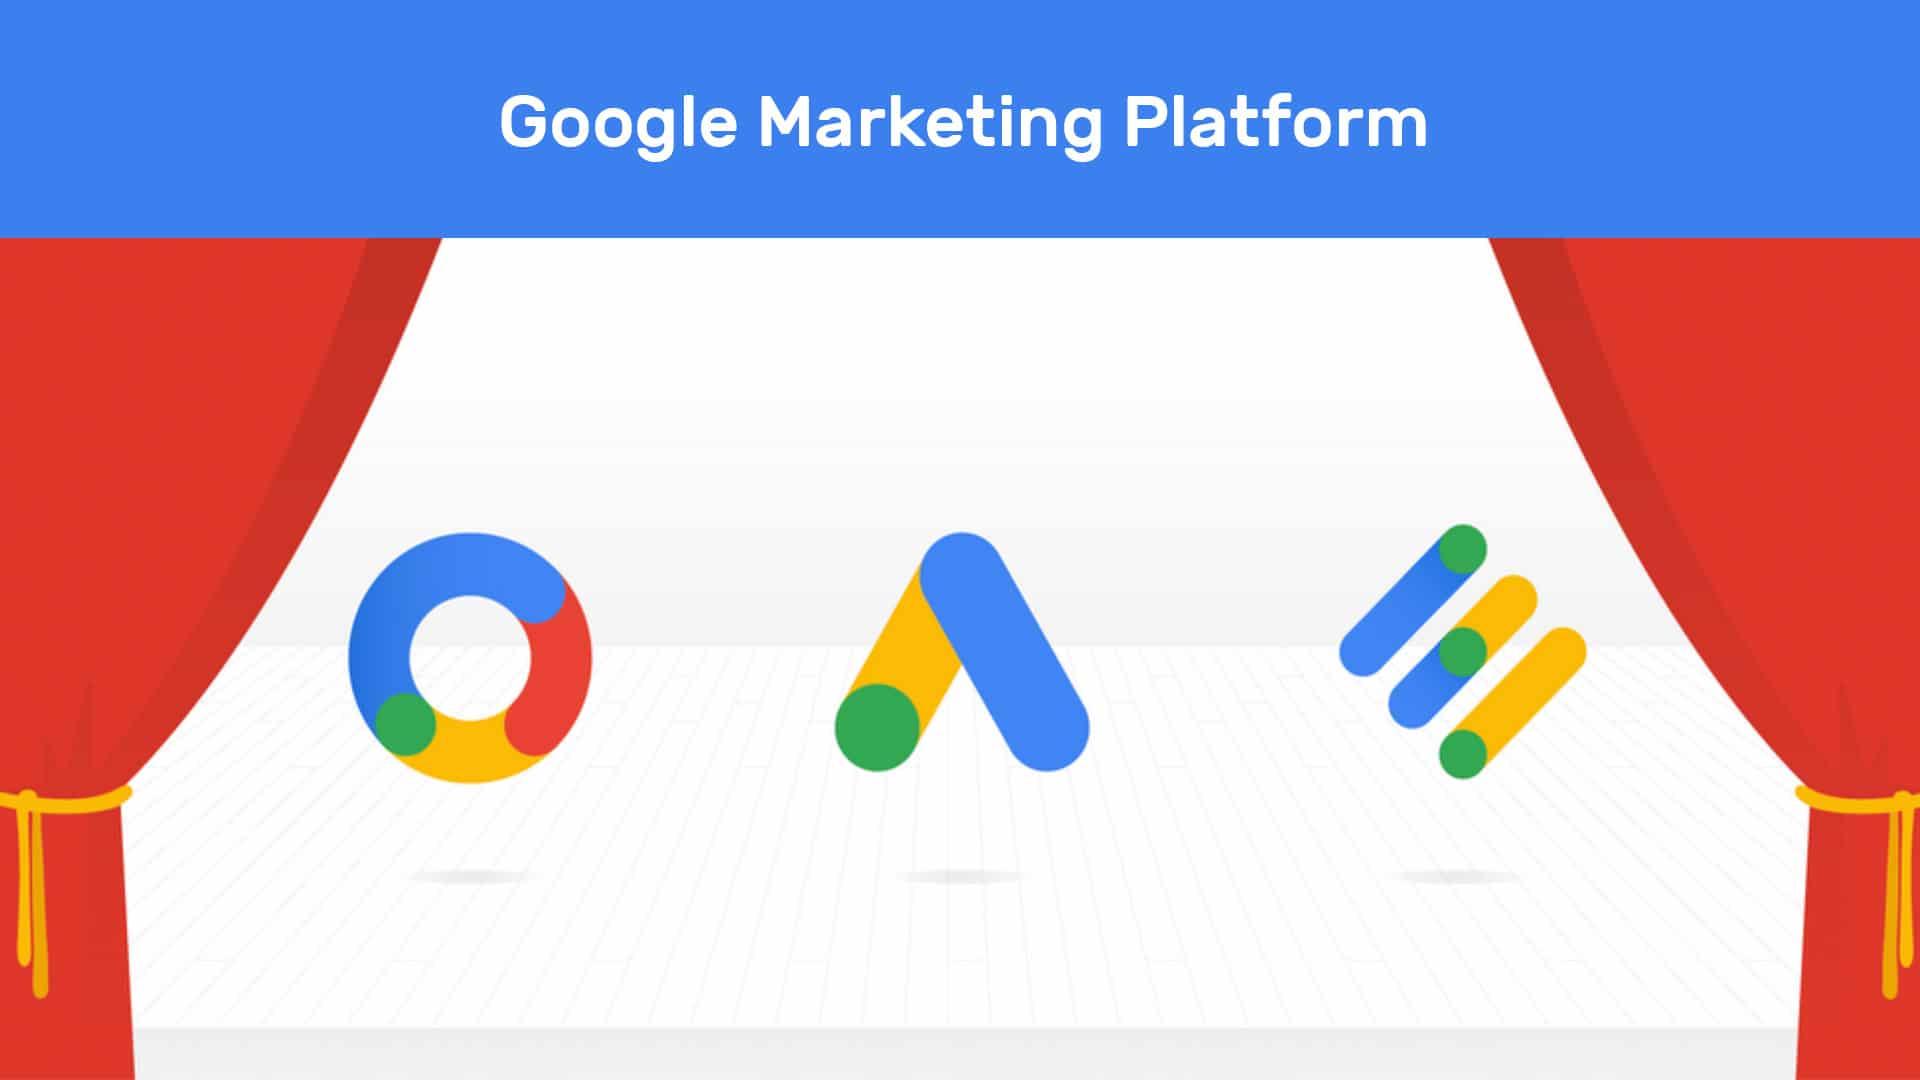 Google apresenta: Google Marketing Platform